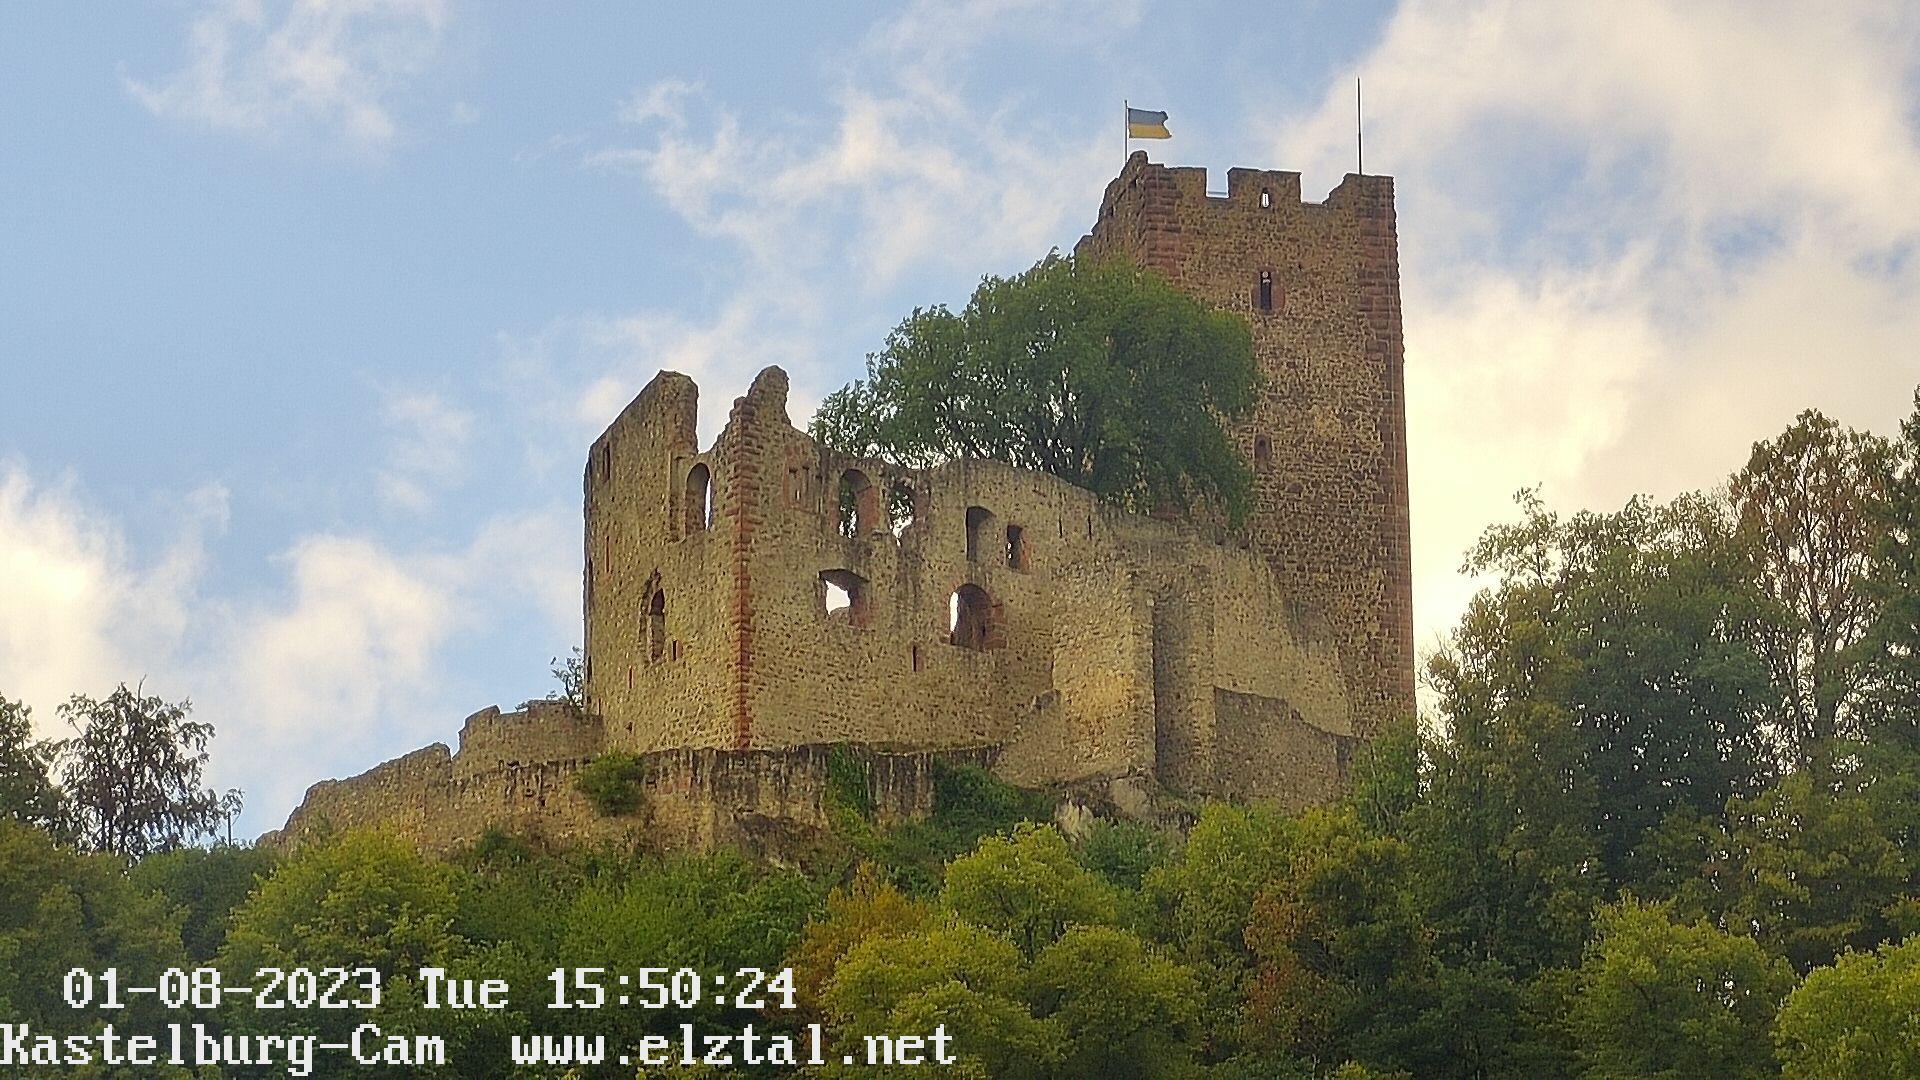 Waldkirch Wed. 15:55